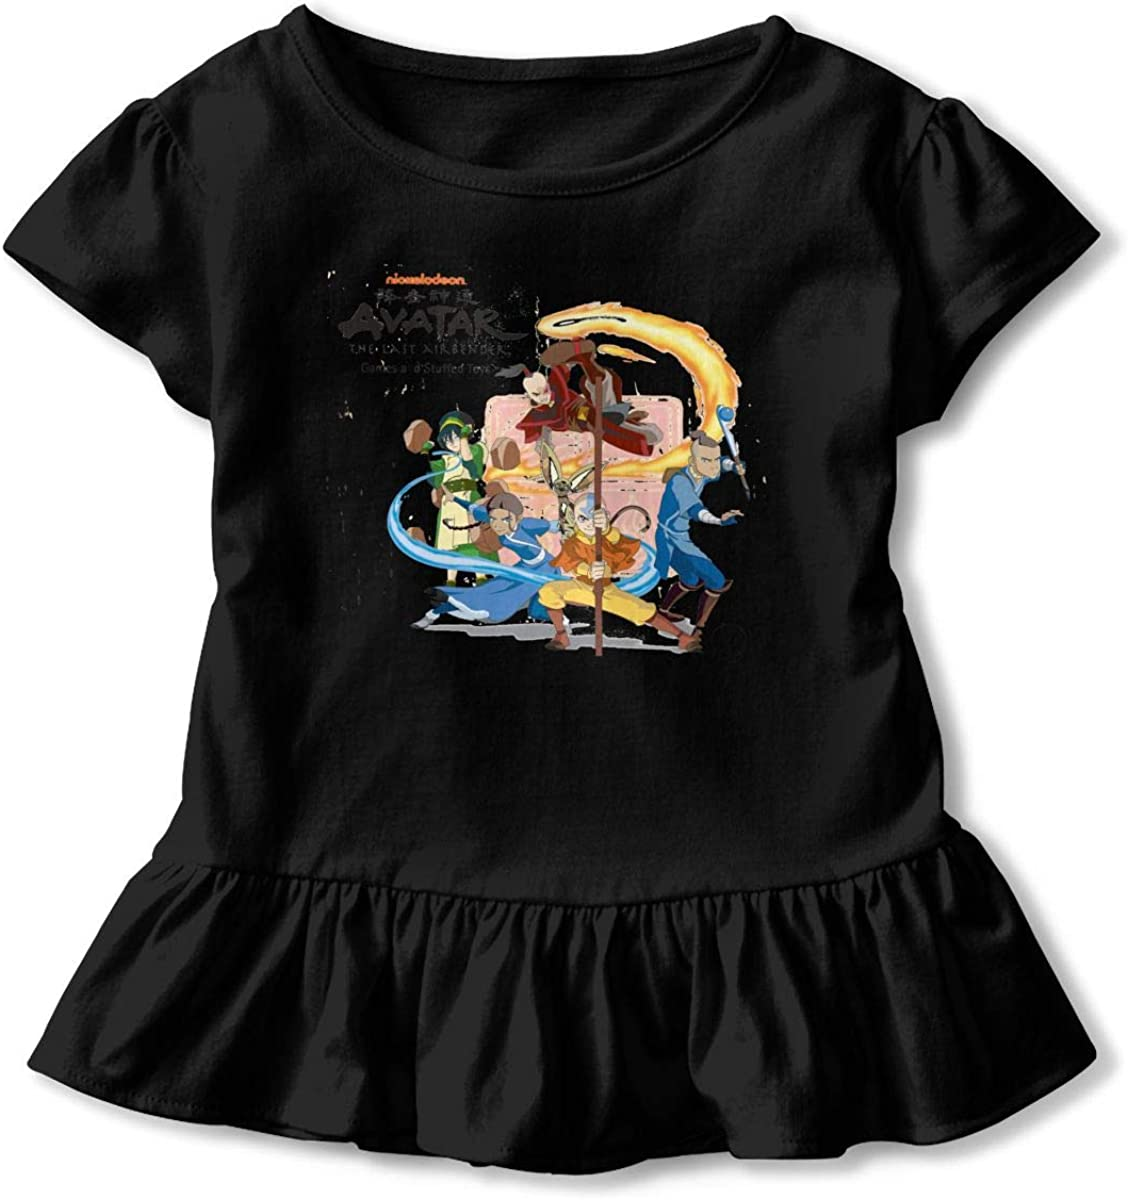 Avatar The Last Airbender Baby Anime Ruffled T-Shirt Baby Humorous GraphicsCrew Neck